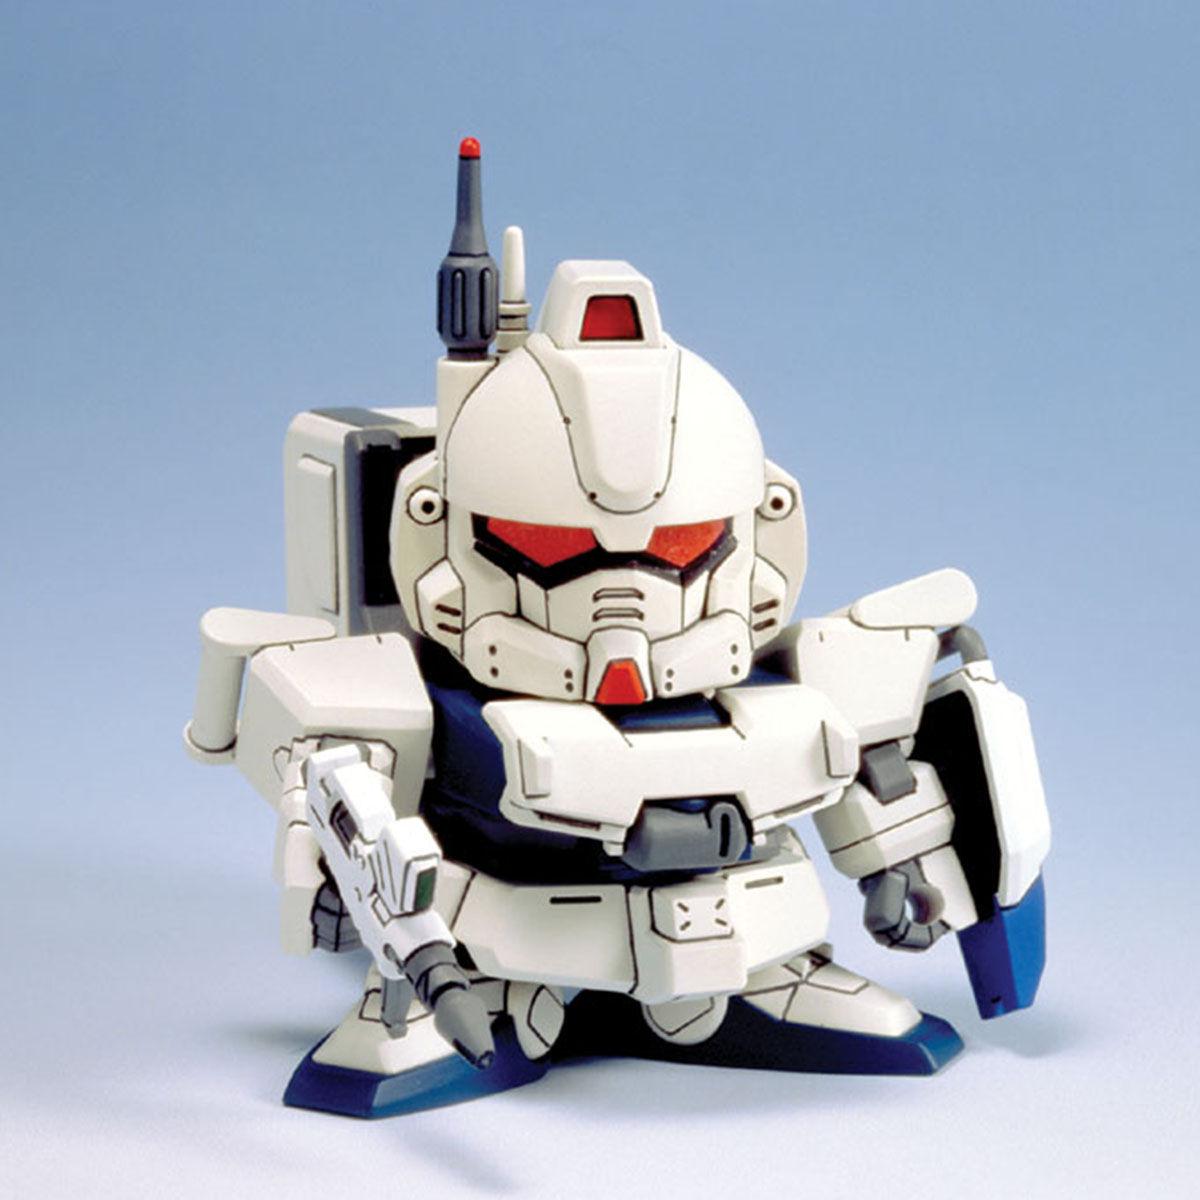 96607SDガンダム GジェネレーションF(GGENERATION-F) 038 RX-79[G]Ez-8 ガンダムイージーエイト [Gundam Ez8] 0076156 5060802 4573102608024 4902425761565